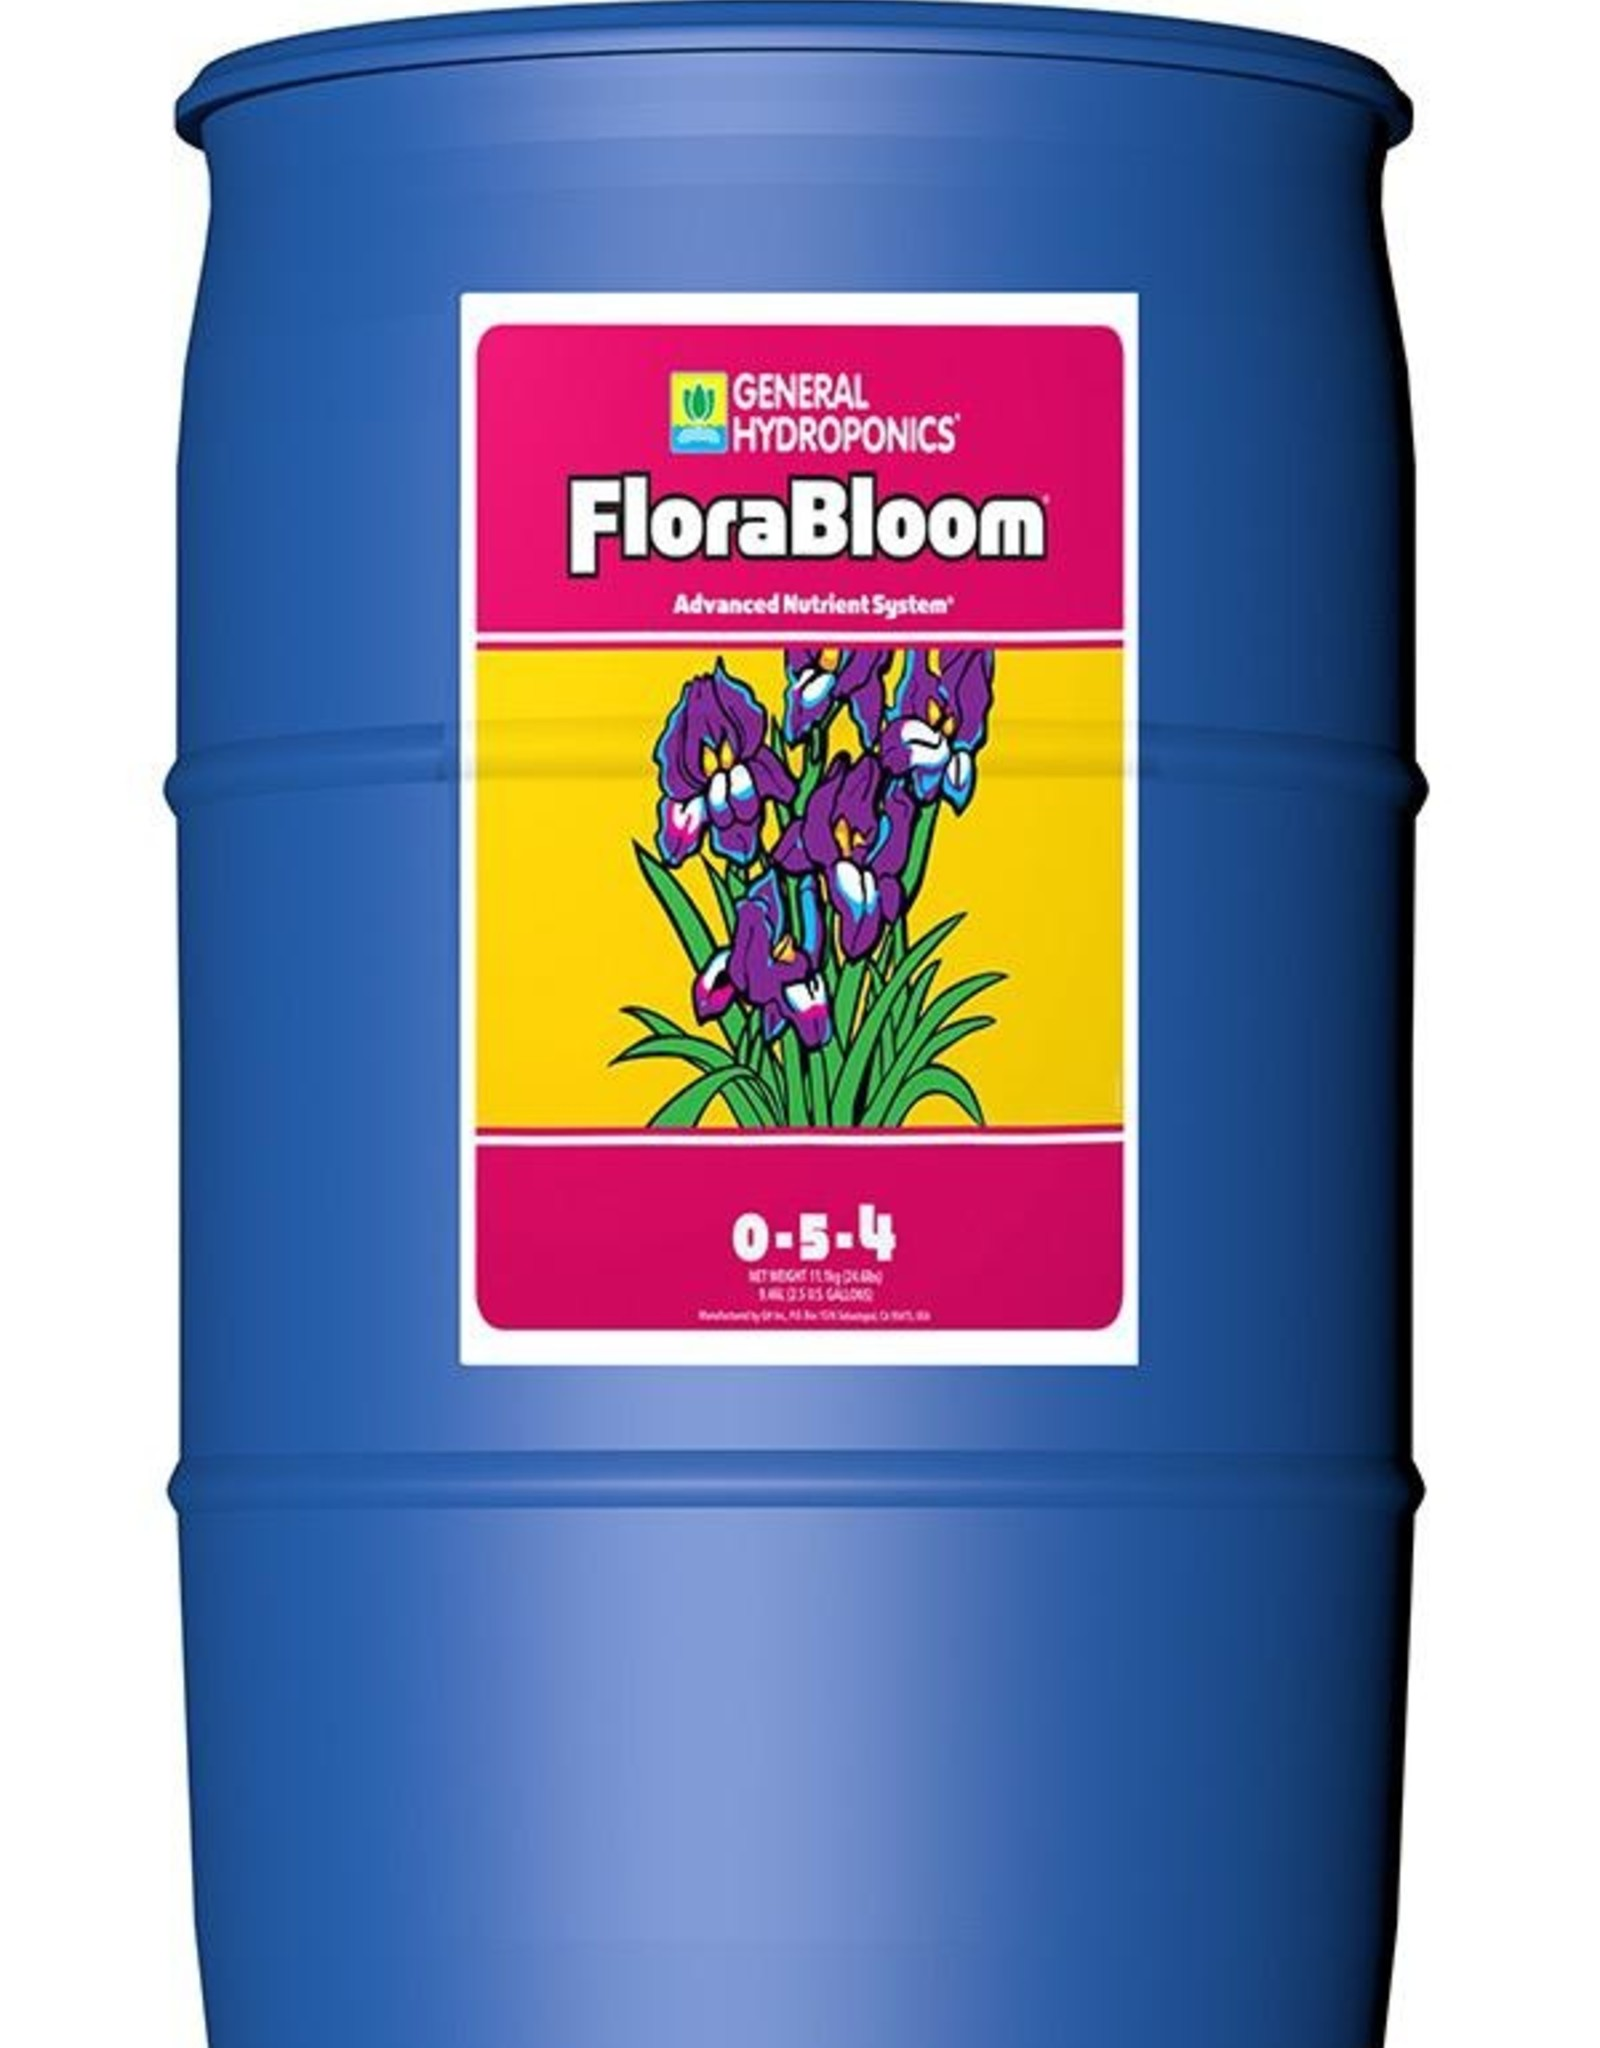 GENERAL HYDROPONICS Stimulates flower and fruit development. Enhances flavor, aroma, and essential oils. Provides high phosphorous, potassium, magnesium and sulfur.